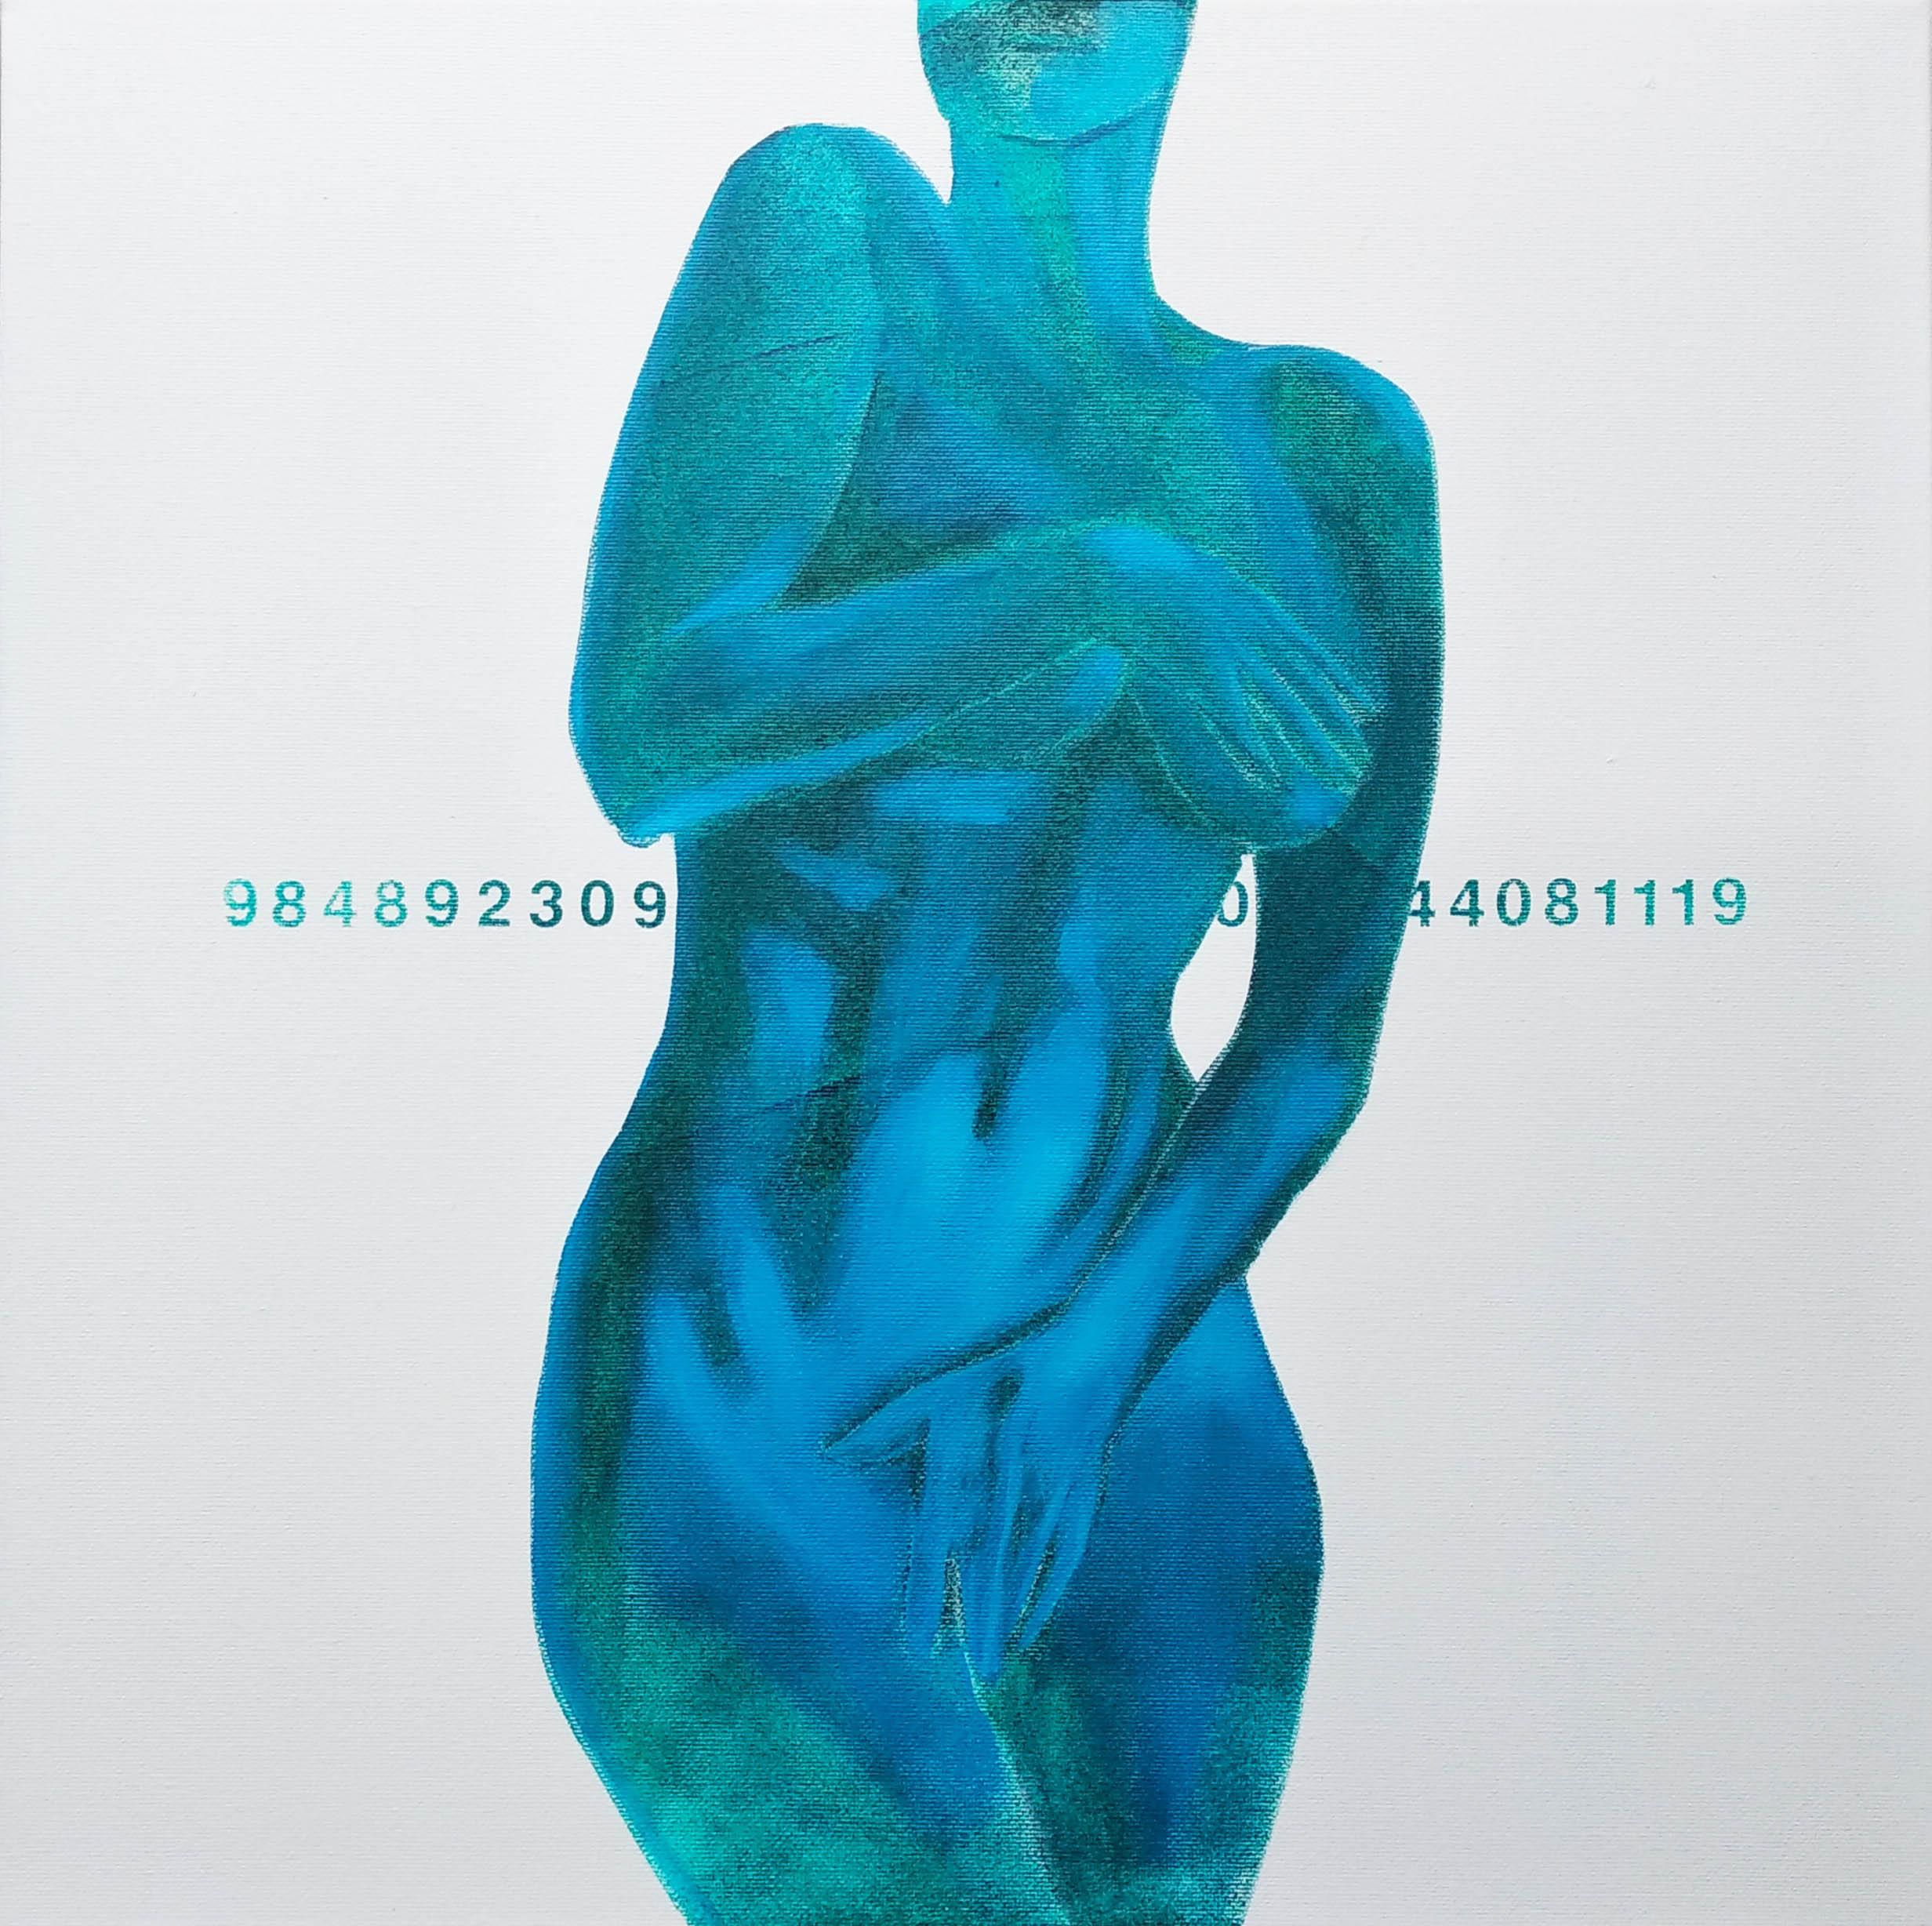 R' 081119, 2019